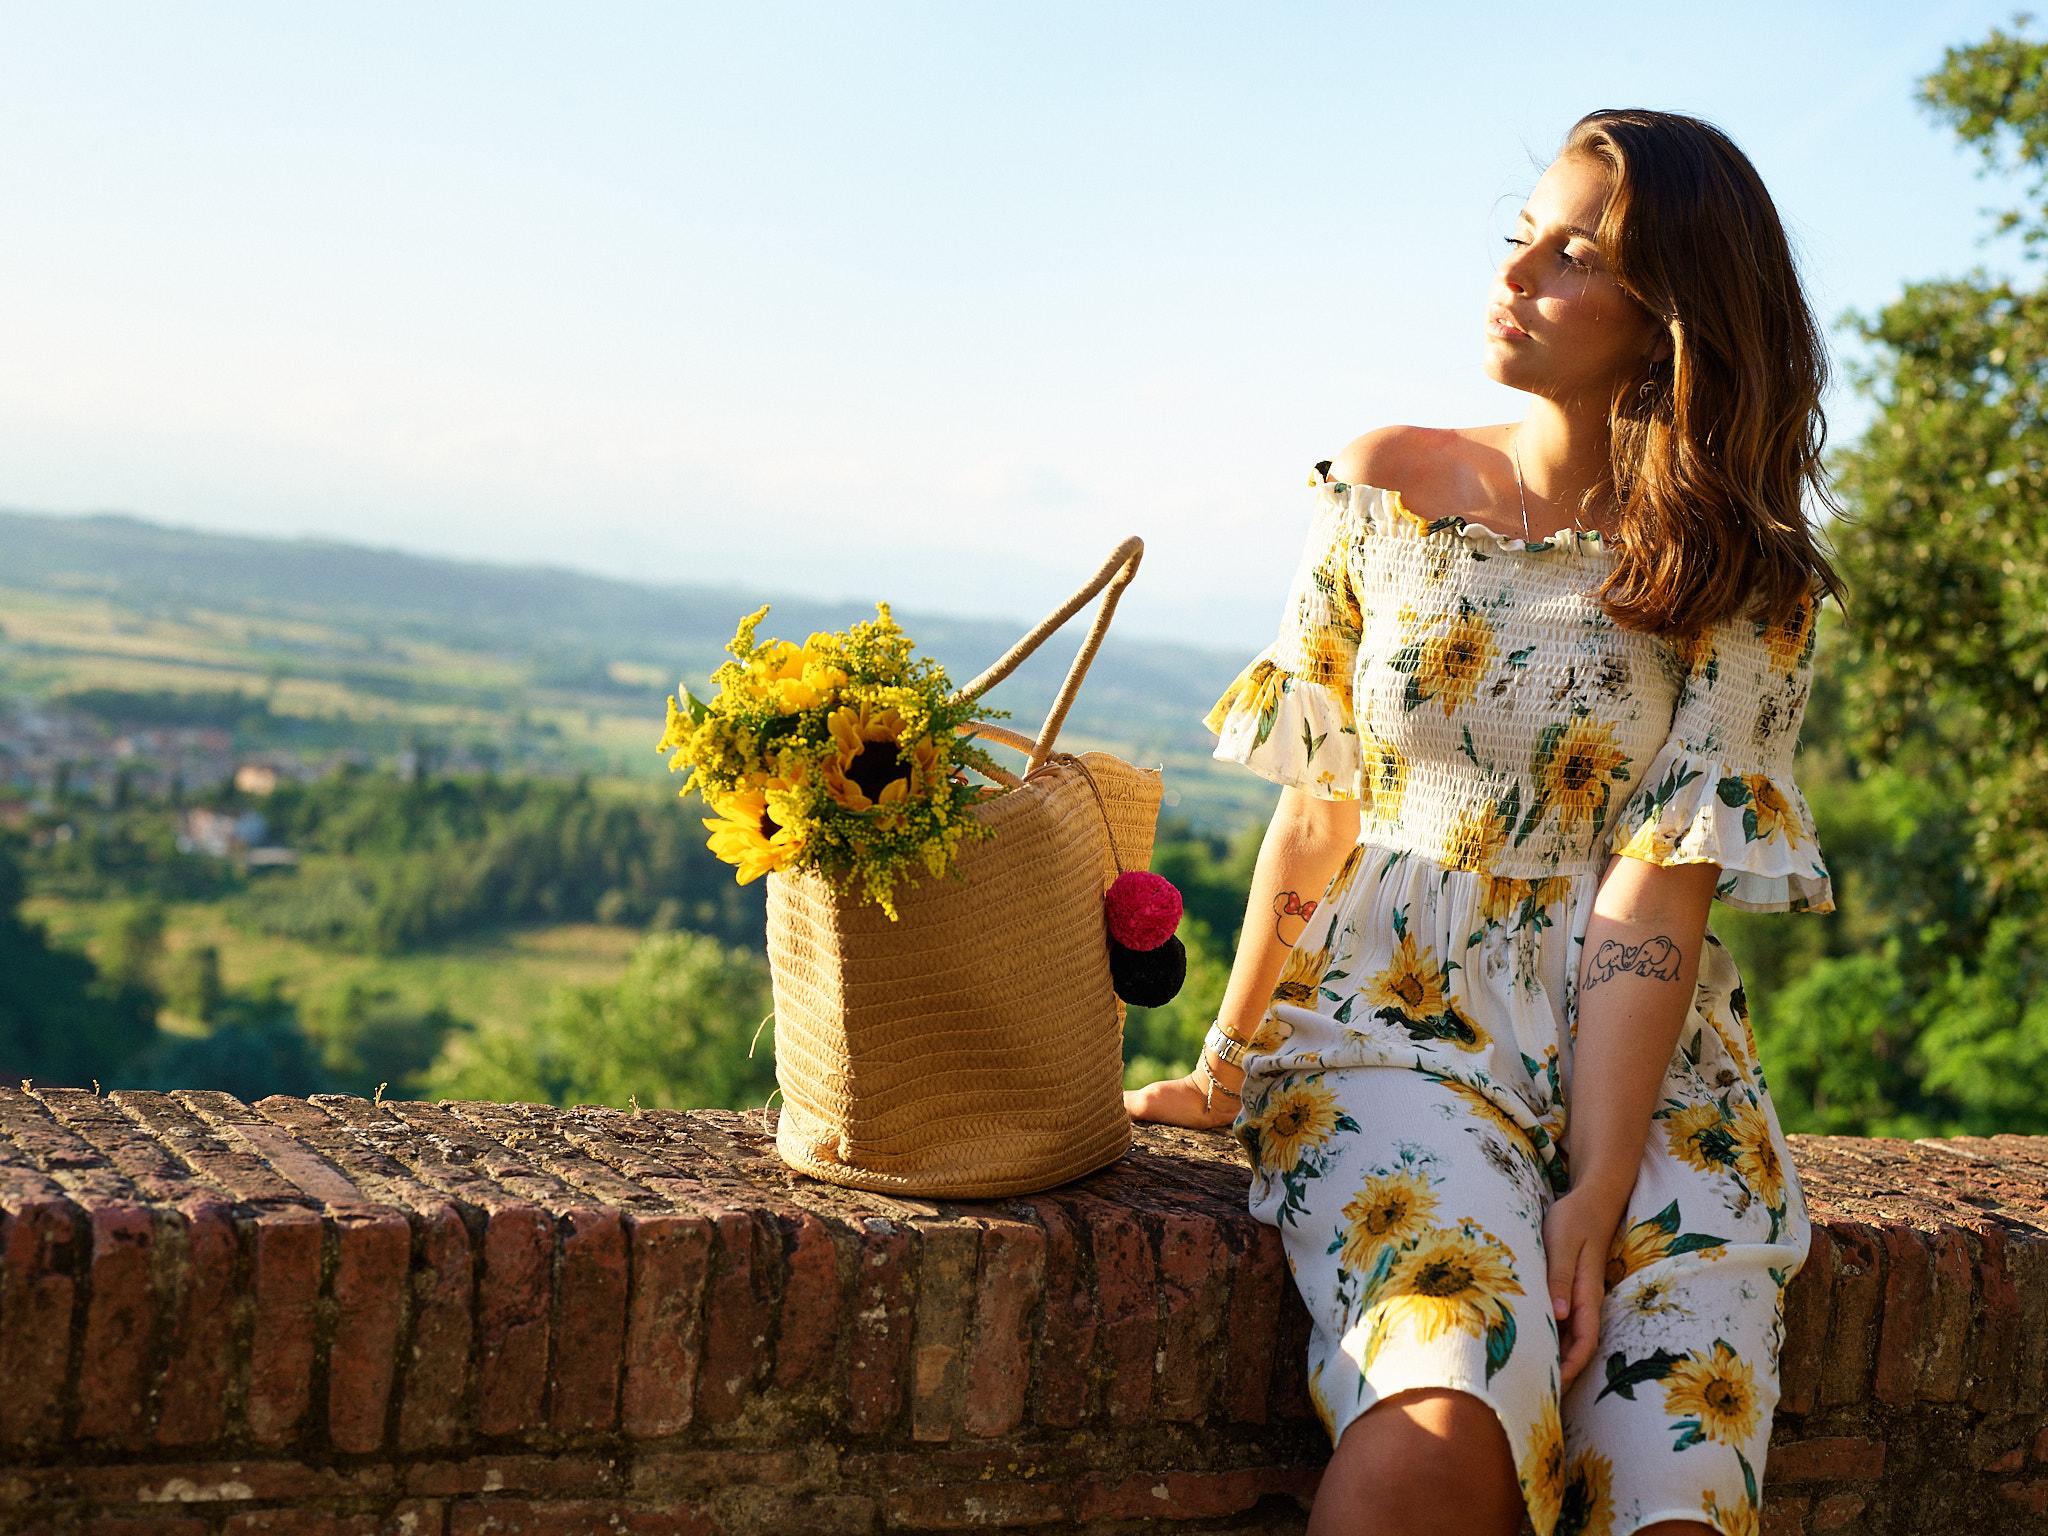 Deodoc-Toscana-Nicole-16.jpg